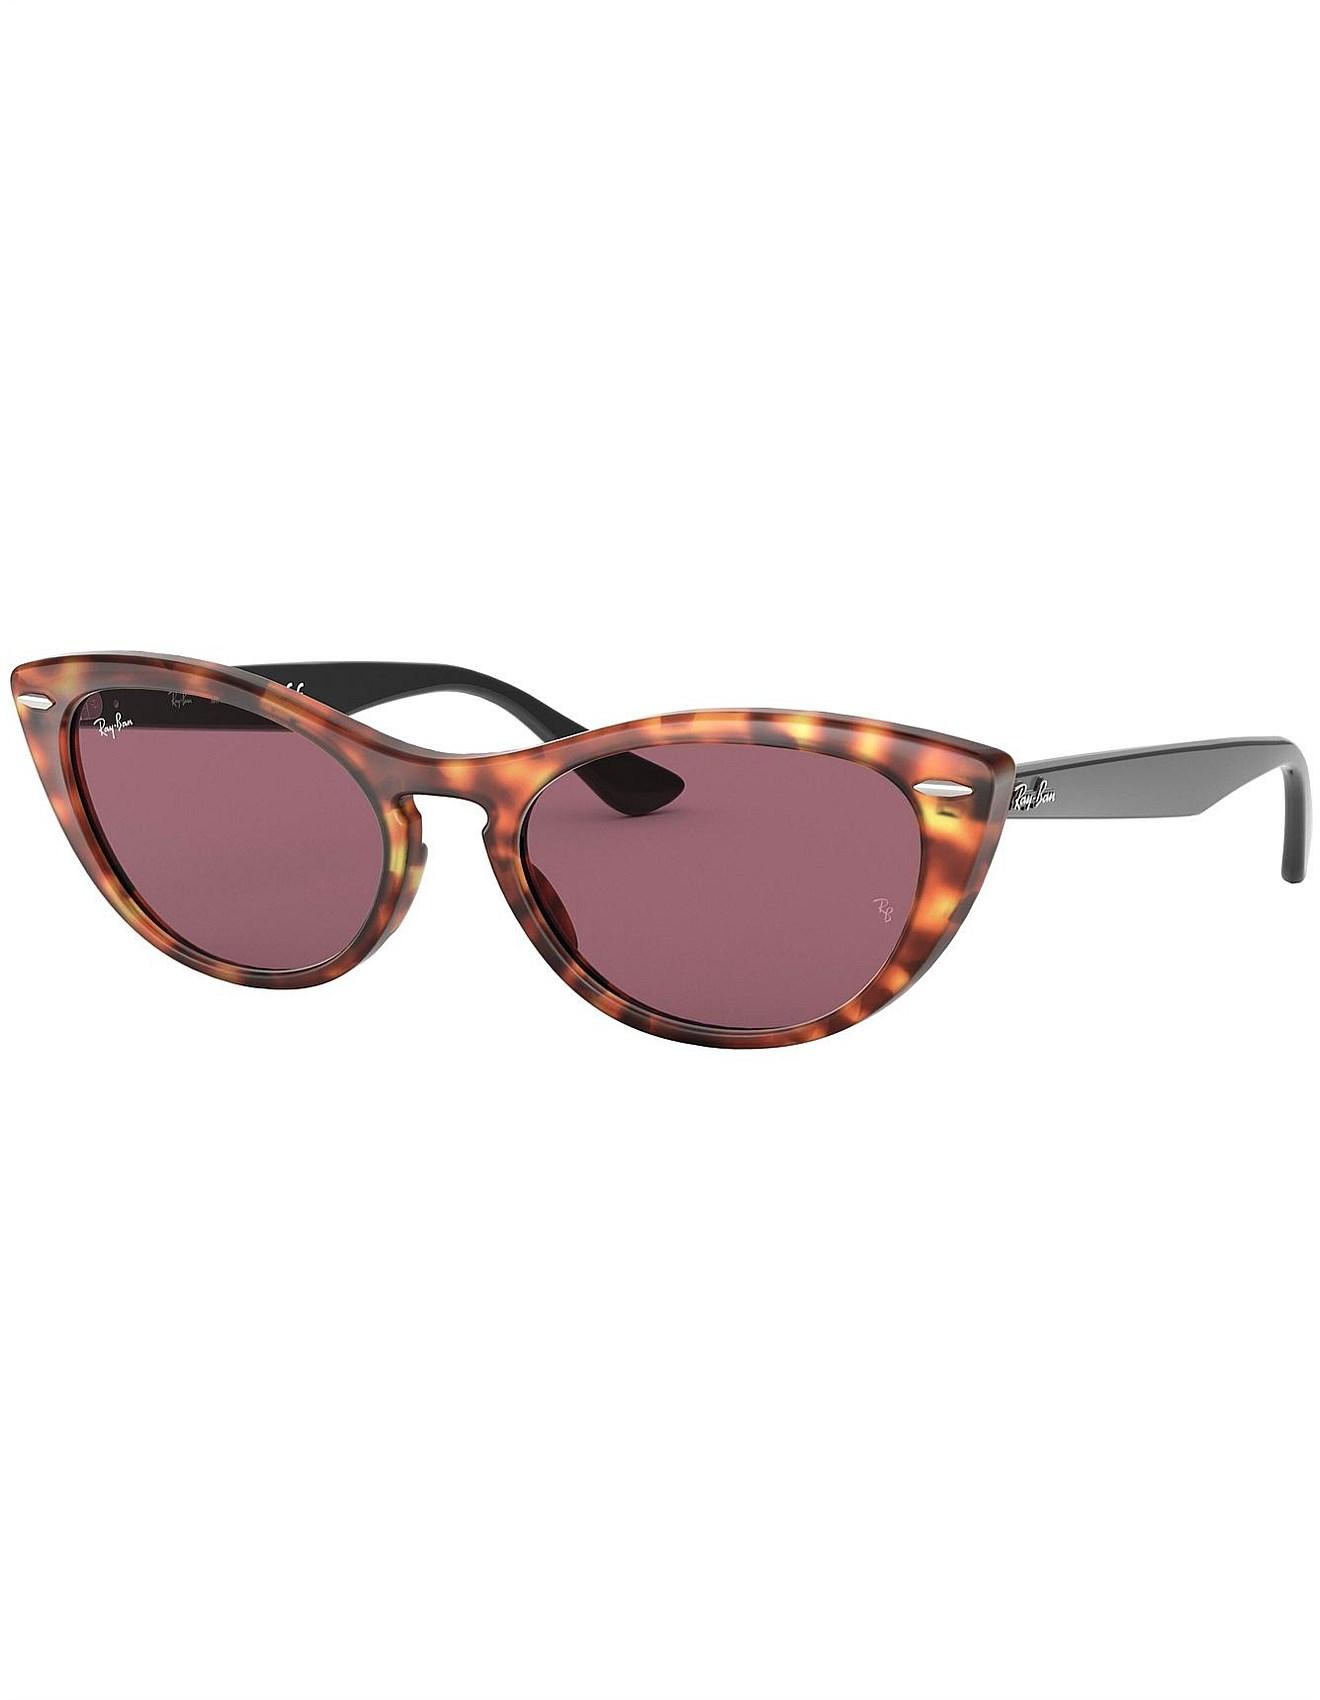 3523ef3ecec9 Cat Eye Sunglasses. 1. Zoom. Ray Ban